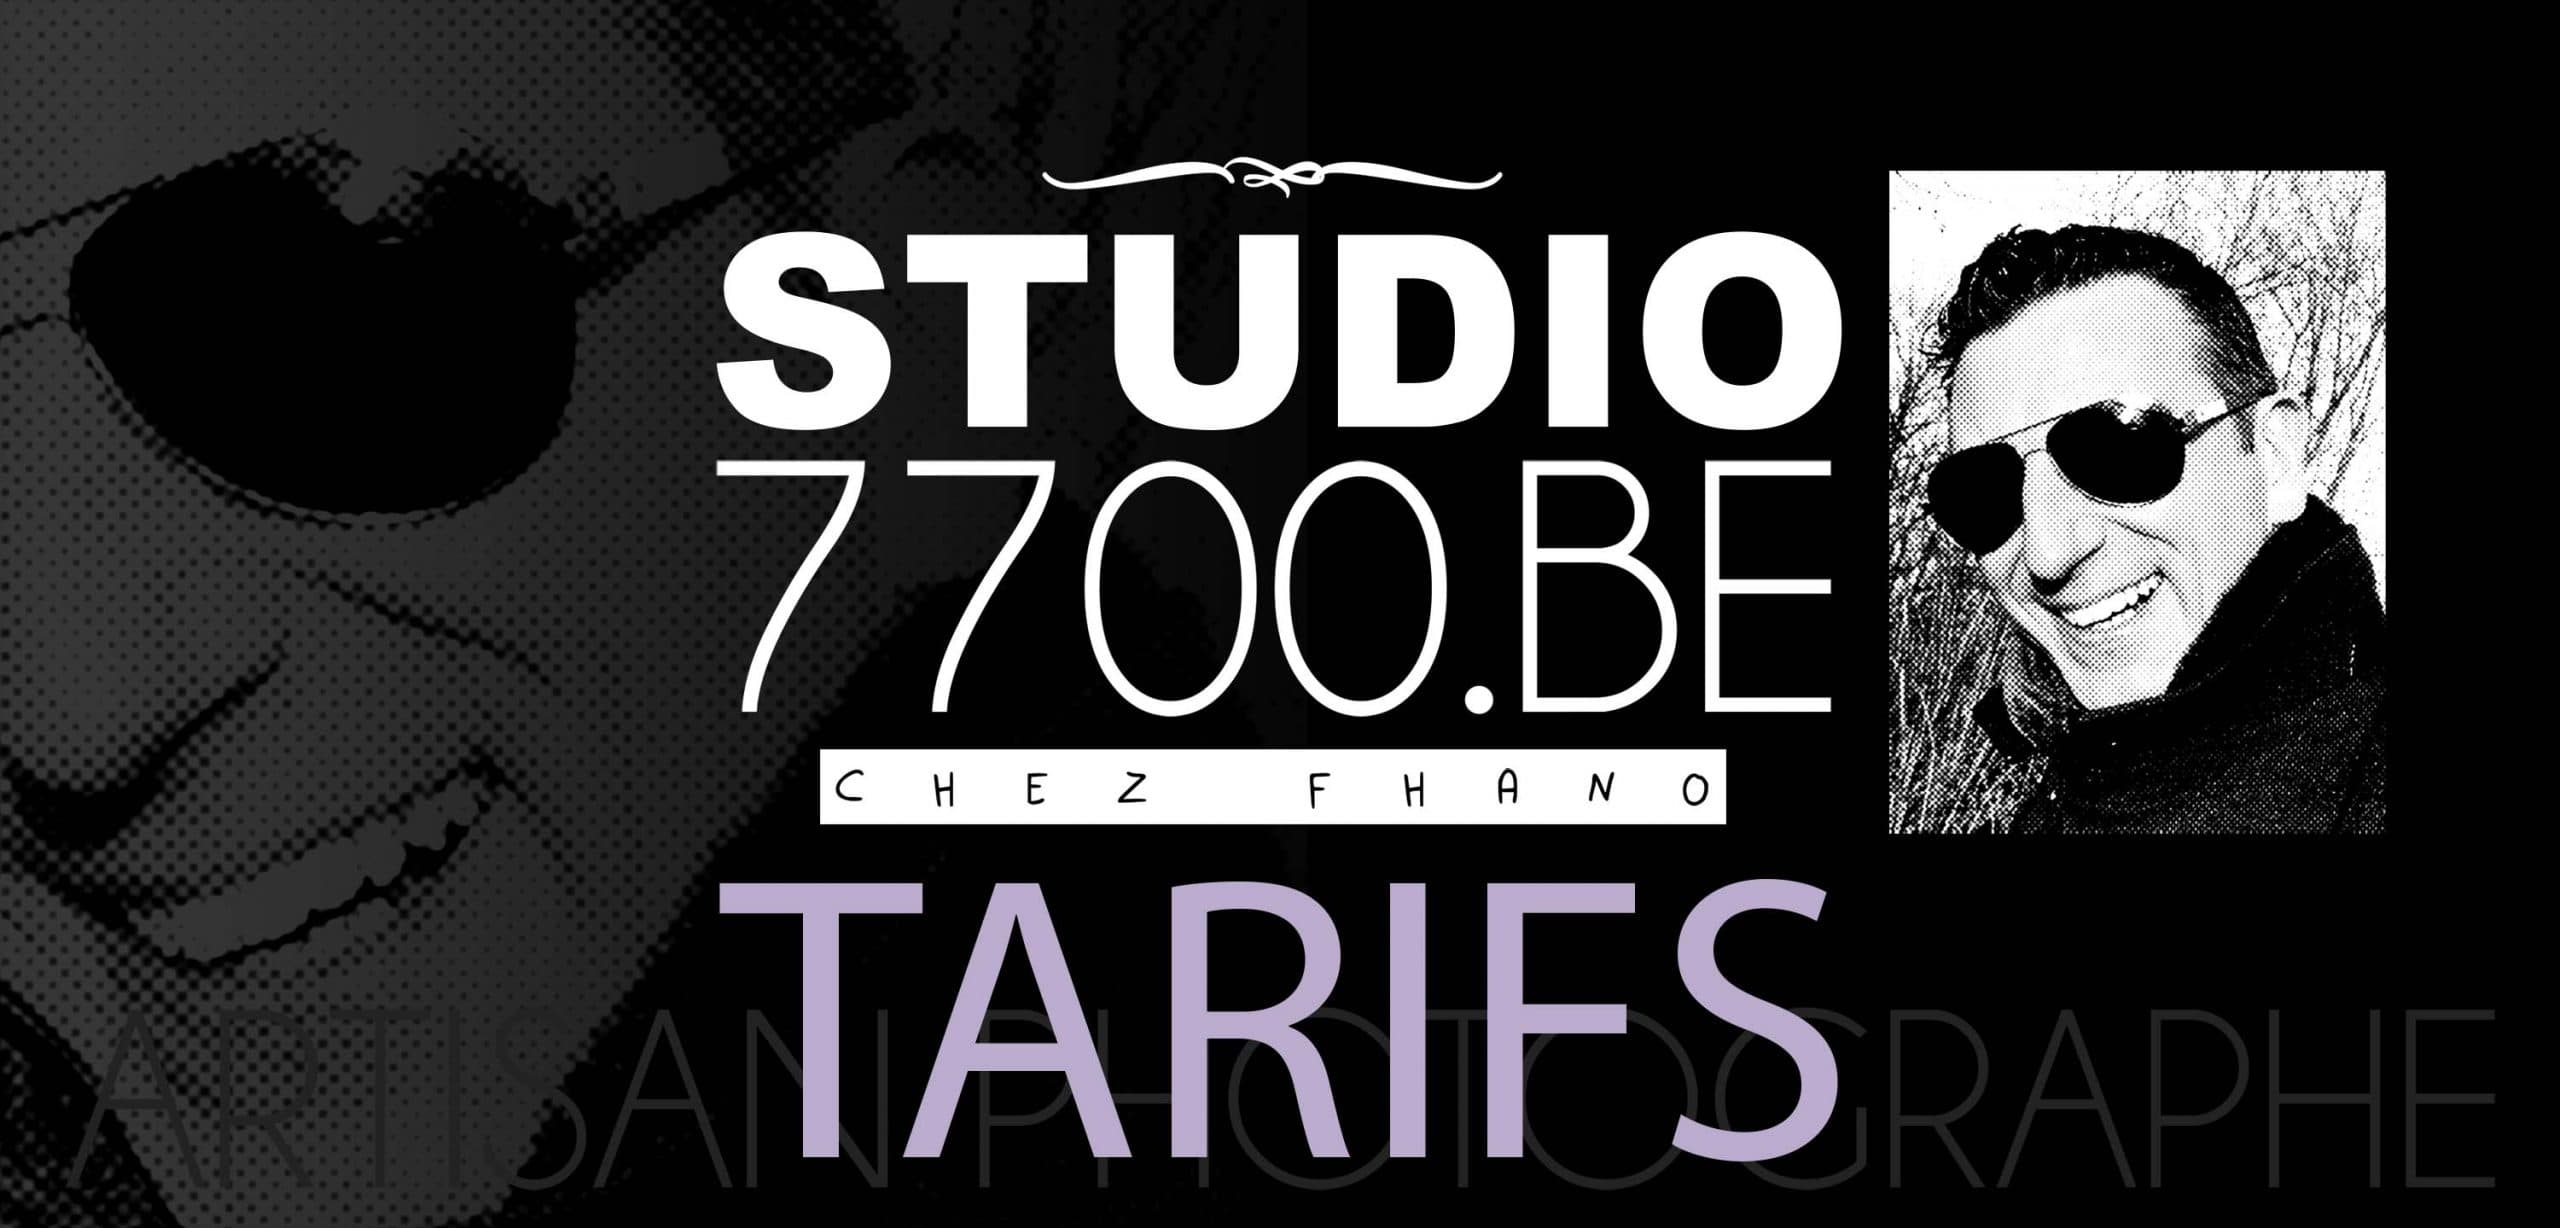 Les tarifs du Studio 7700.BE chez Fhano